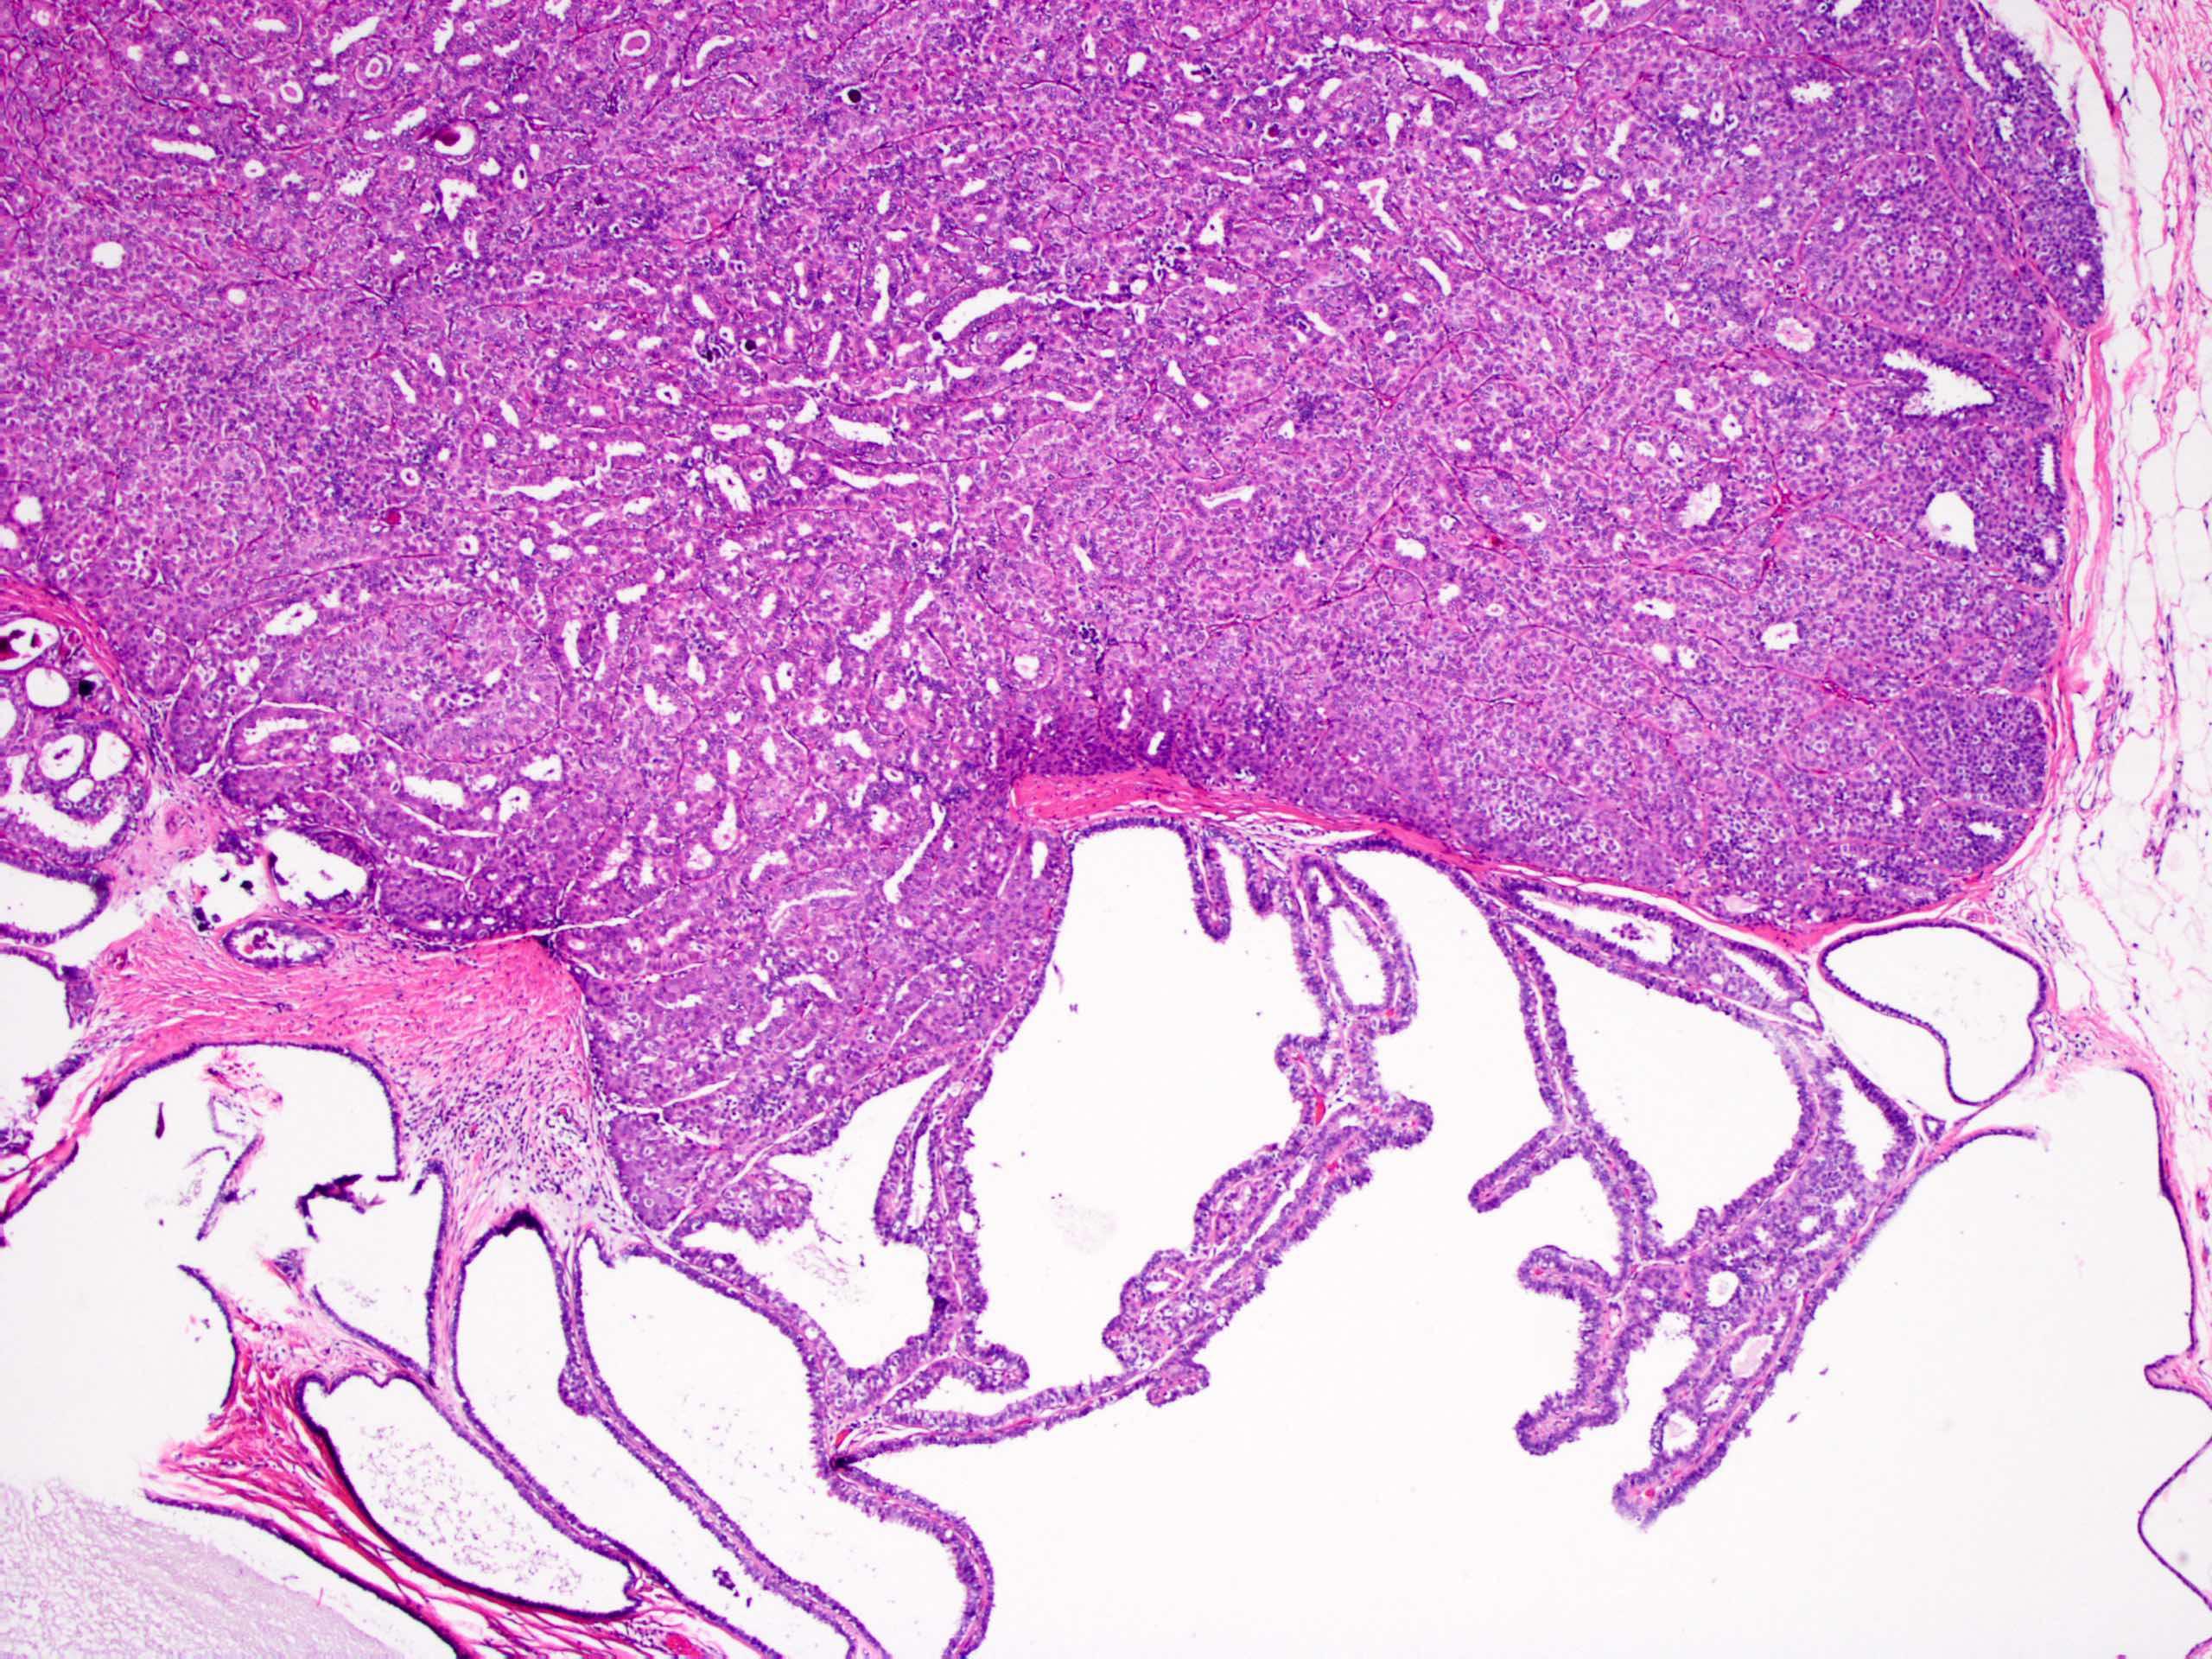 intraductalis papilloma és ductalis papilloma